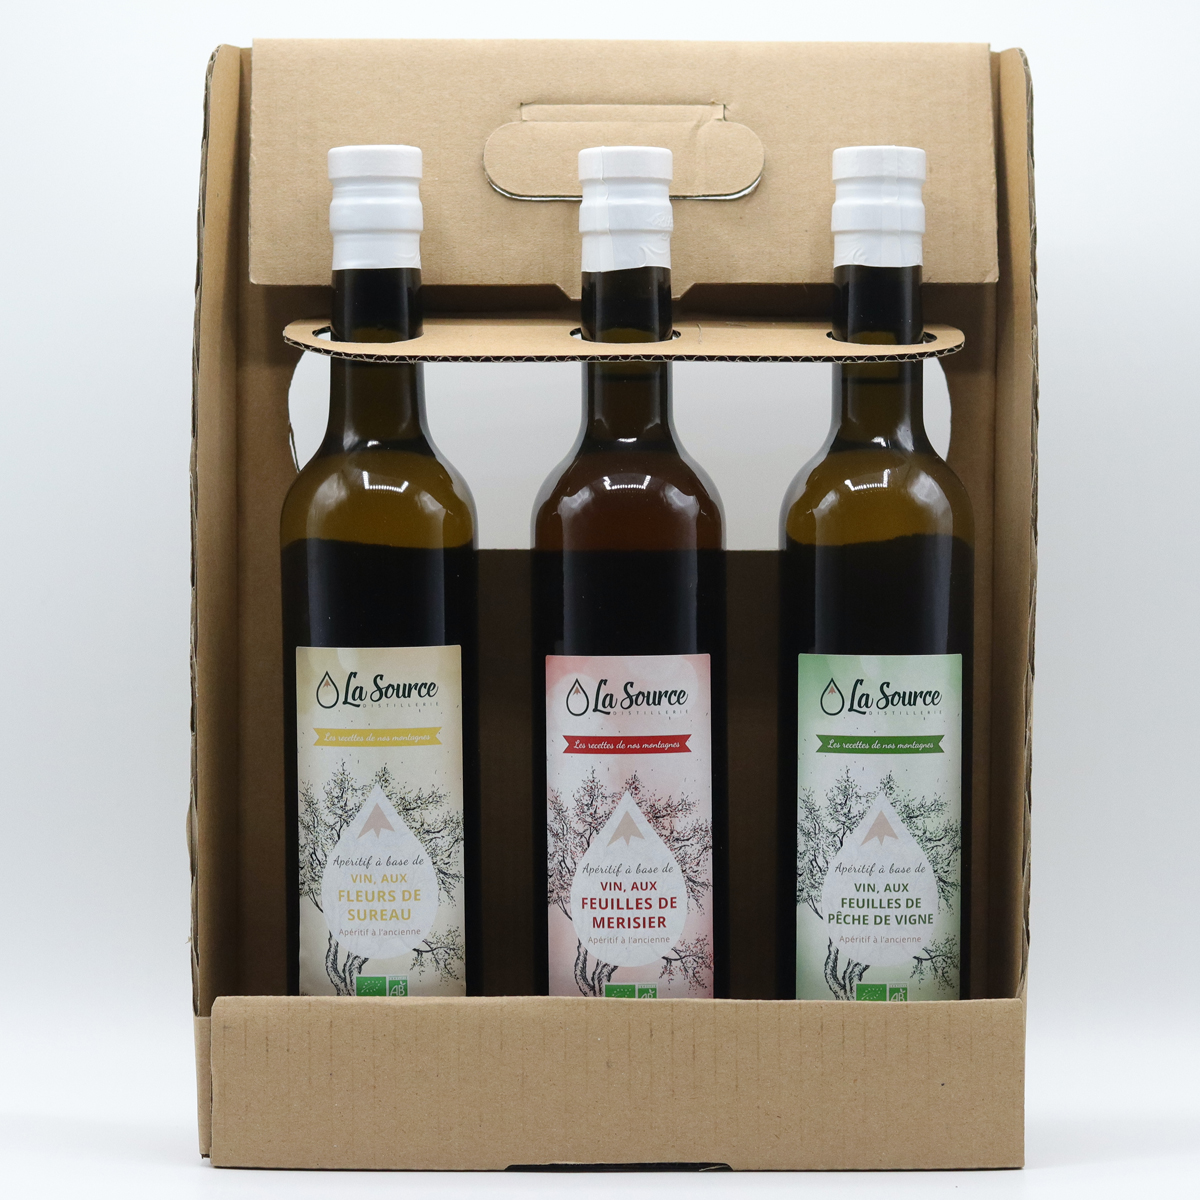 https://www.lasource-distillerie.fr/wp-content/uploads/2021/09/coffret-vin.jpg